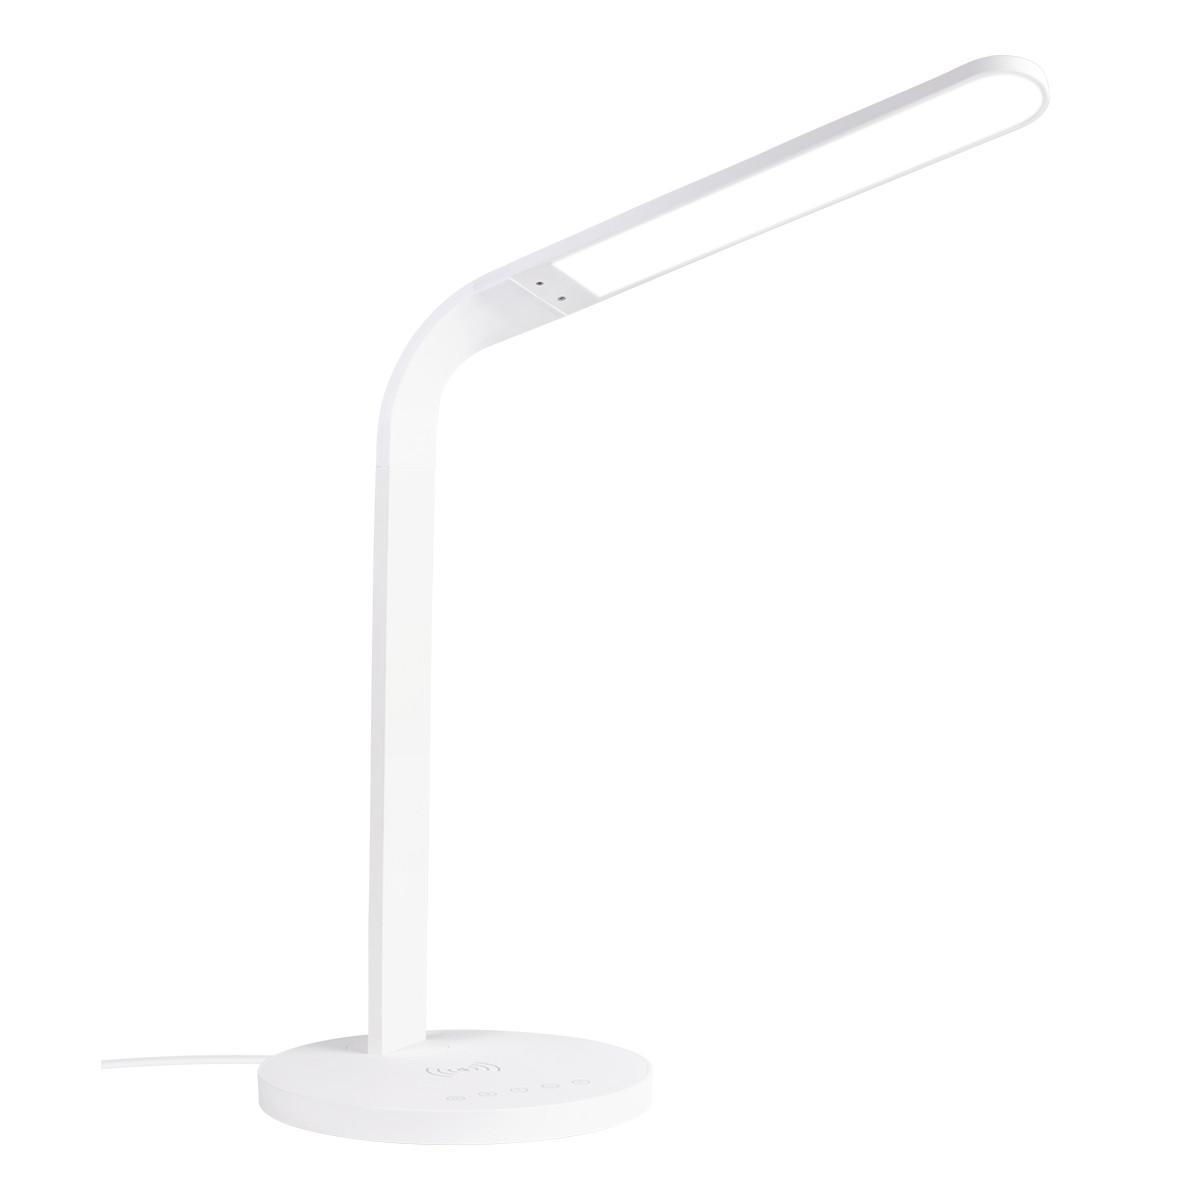 DELTACO Office LED bordslampa med trådlös laddare, 10W, 400lm